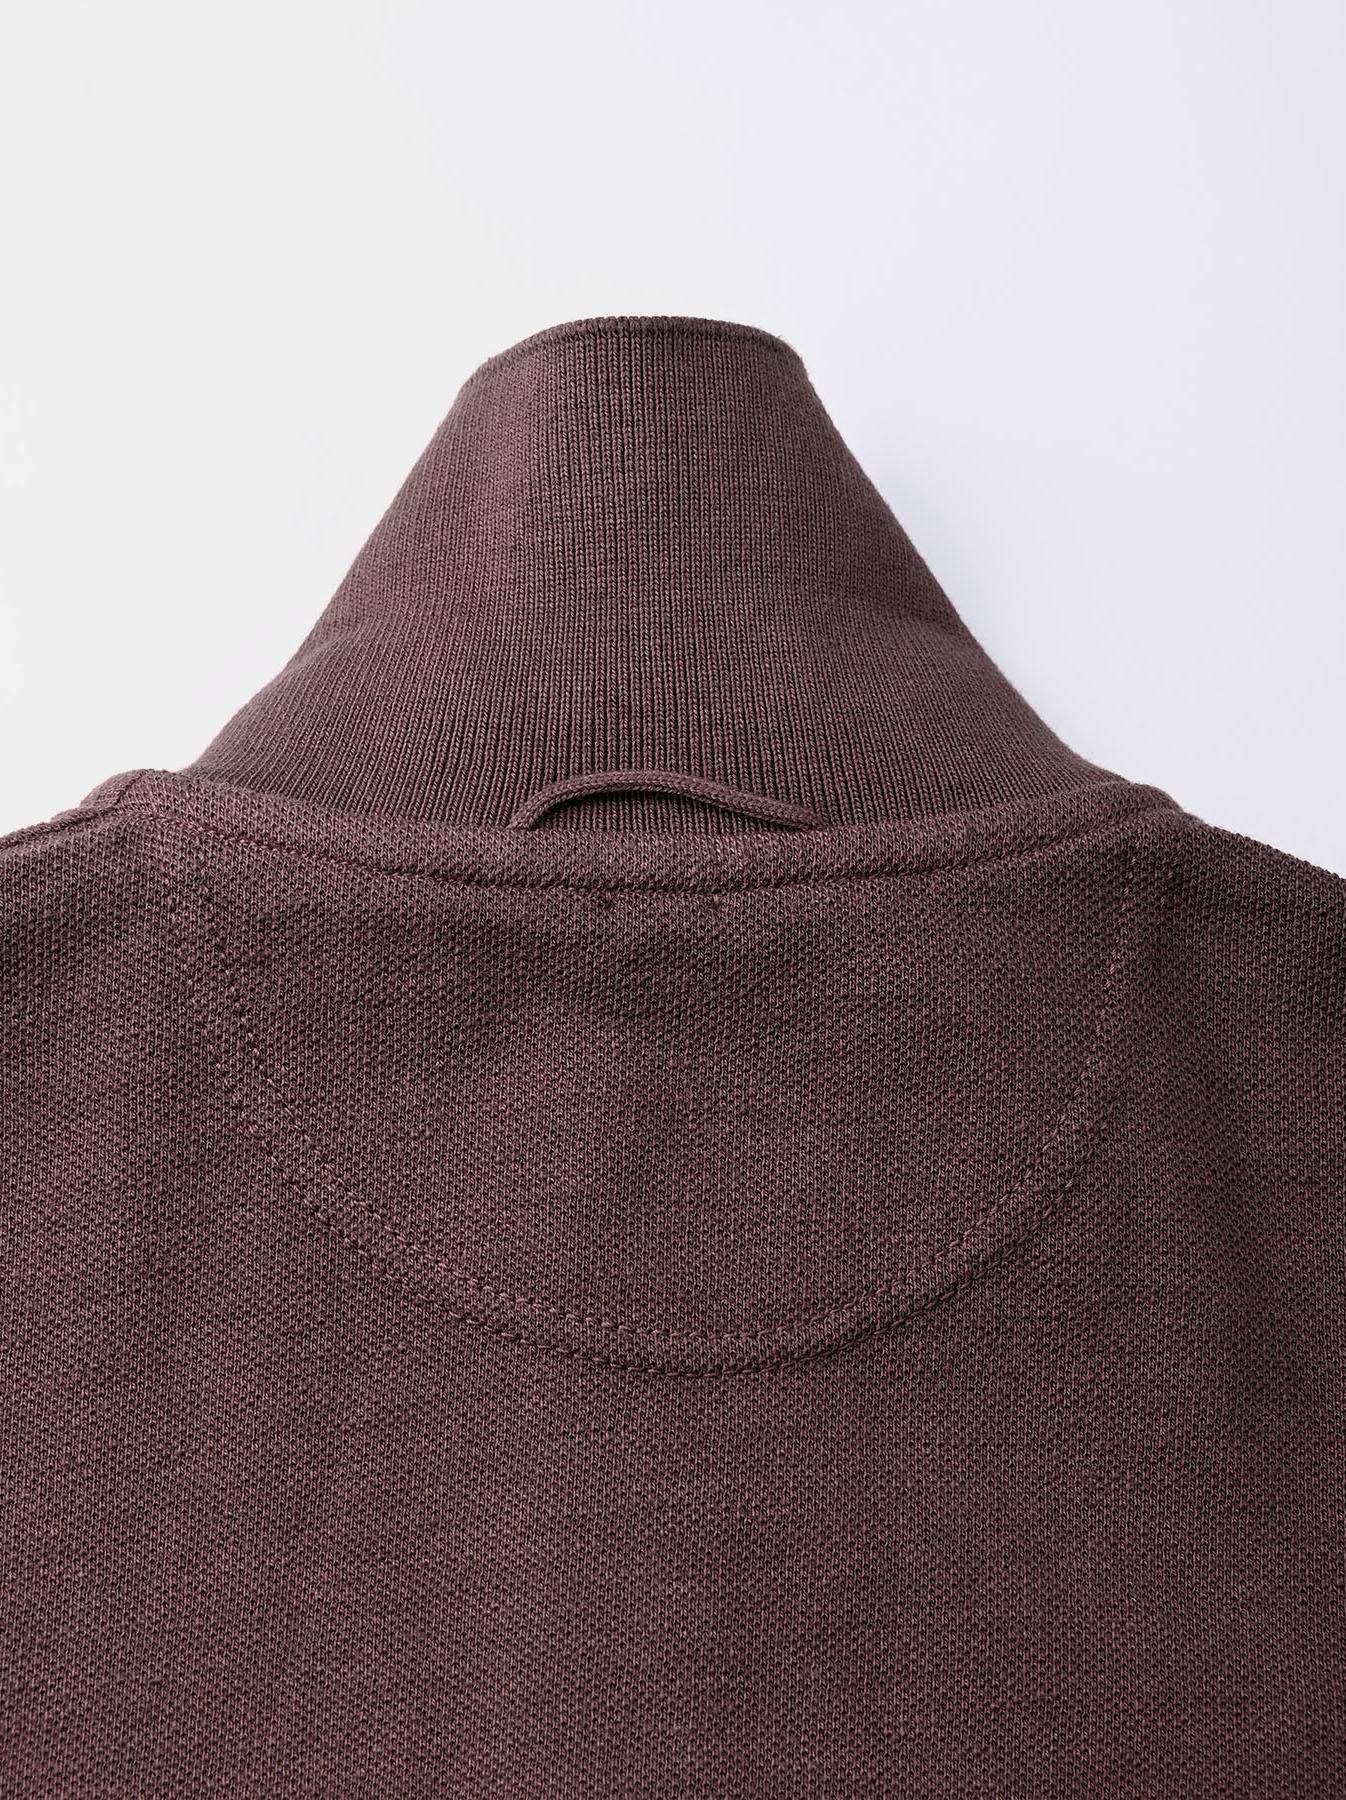 Kanoko Shiokaze Long-sleeved Square Polo Shirt (0521)-10